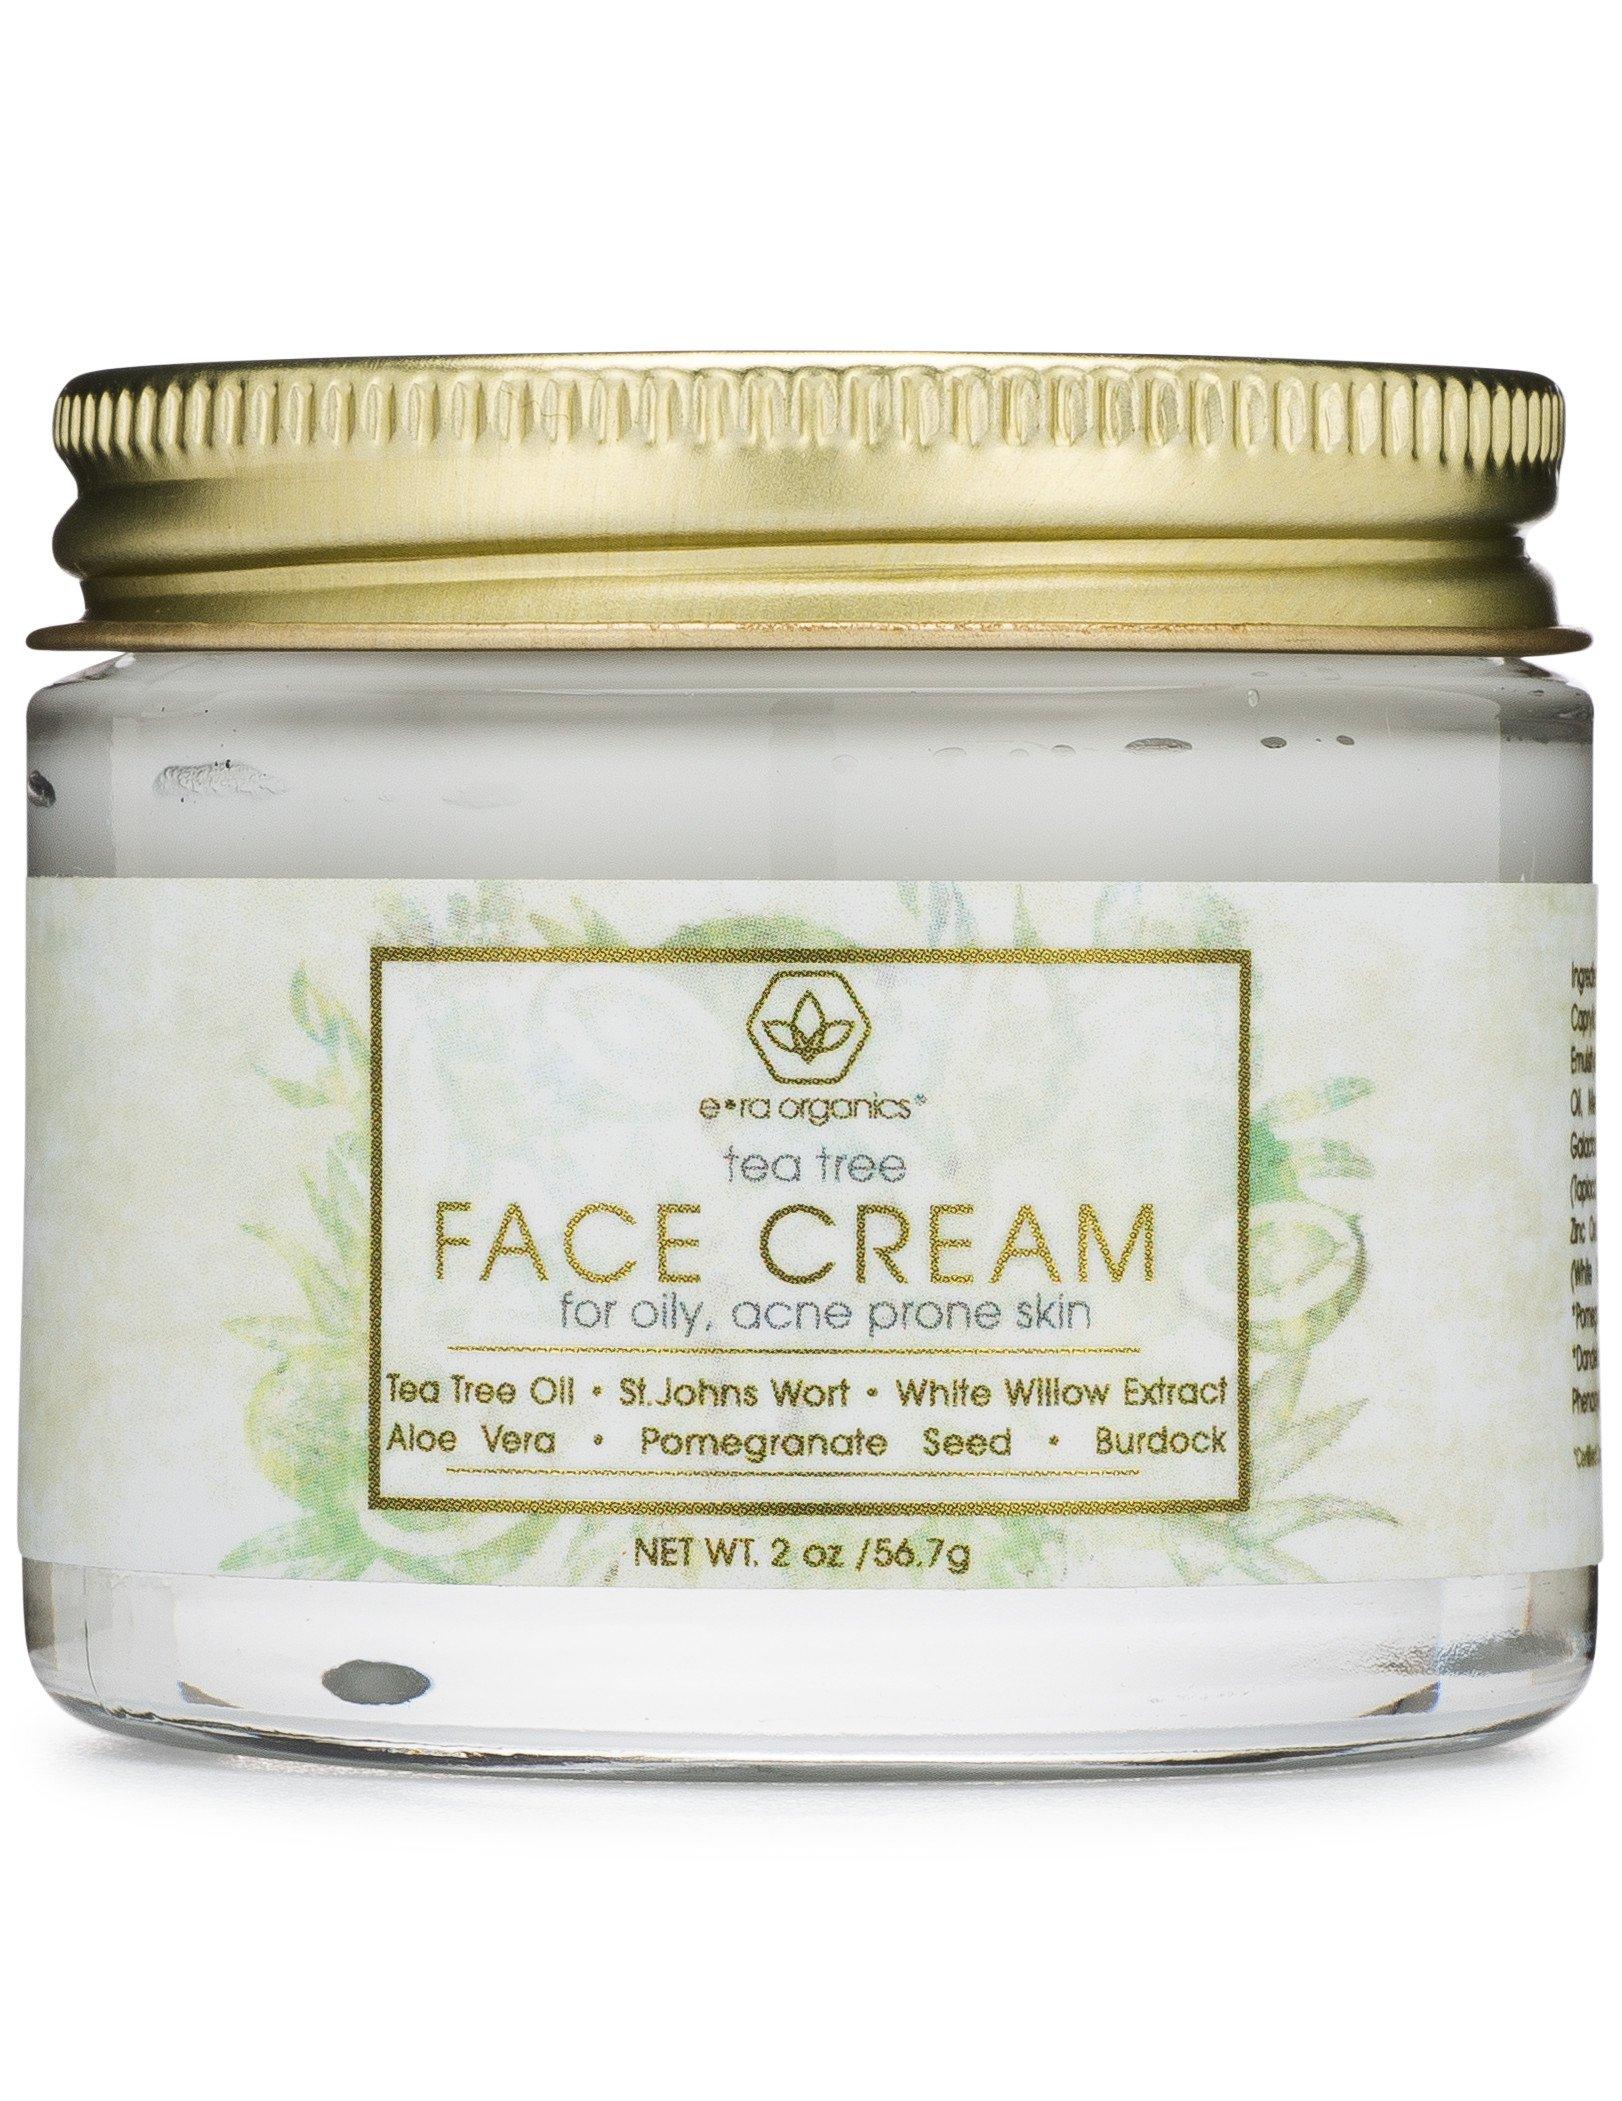 Tea Tree Oil Face Cream - For Oily, Acne Prone Skin Care Natural & Organic Facial Moisturizer with 7X Ingredients For Rosacea, Cystic Acne, Blackheads & Redness 2oz Era-Organics by Era Organics